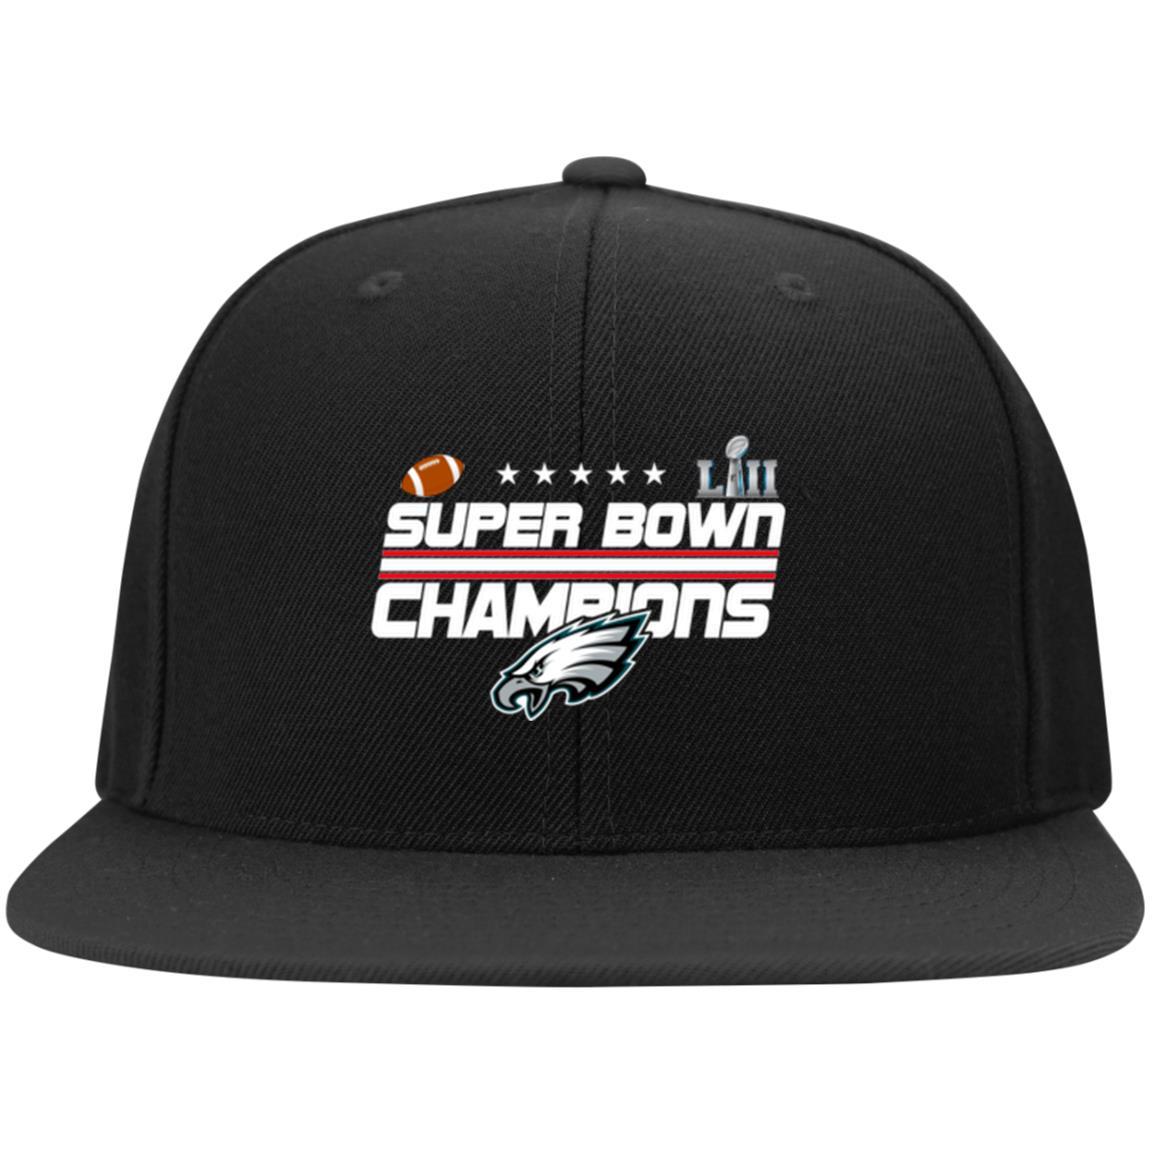 image 260 - Eagles Super Bowl Champions Hats